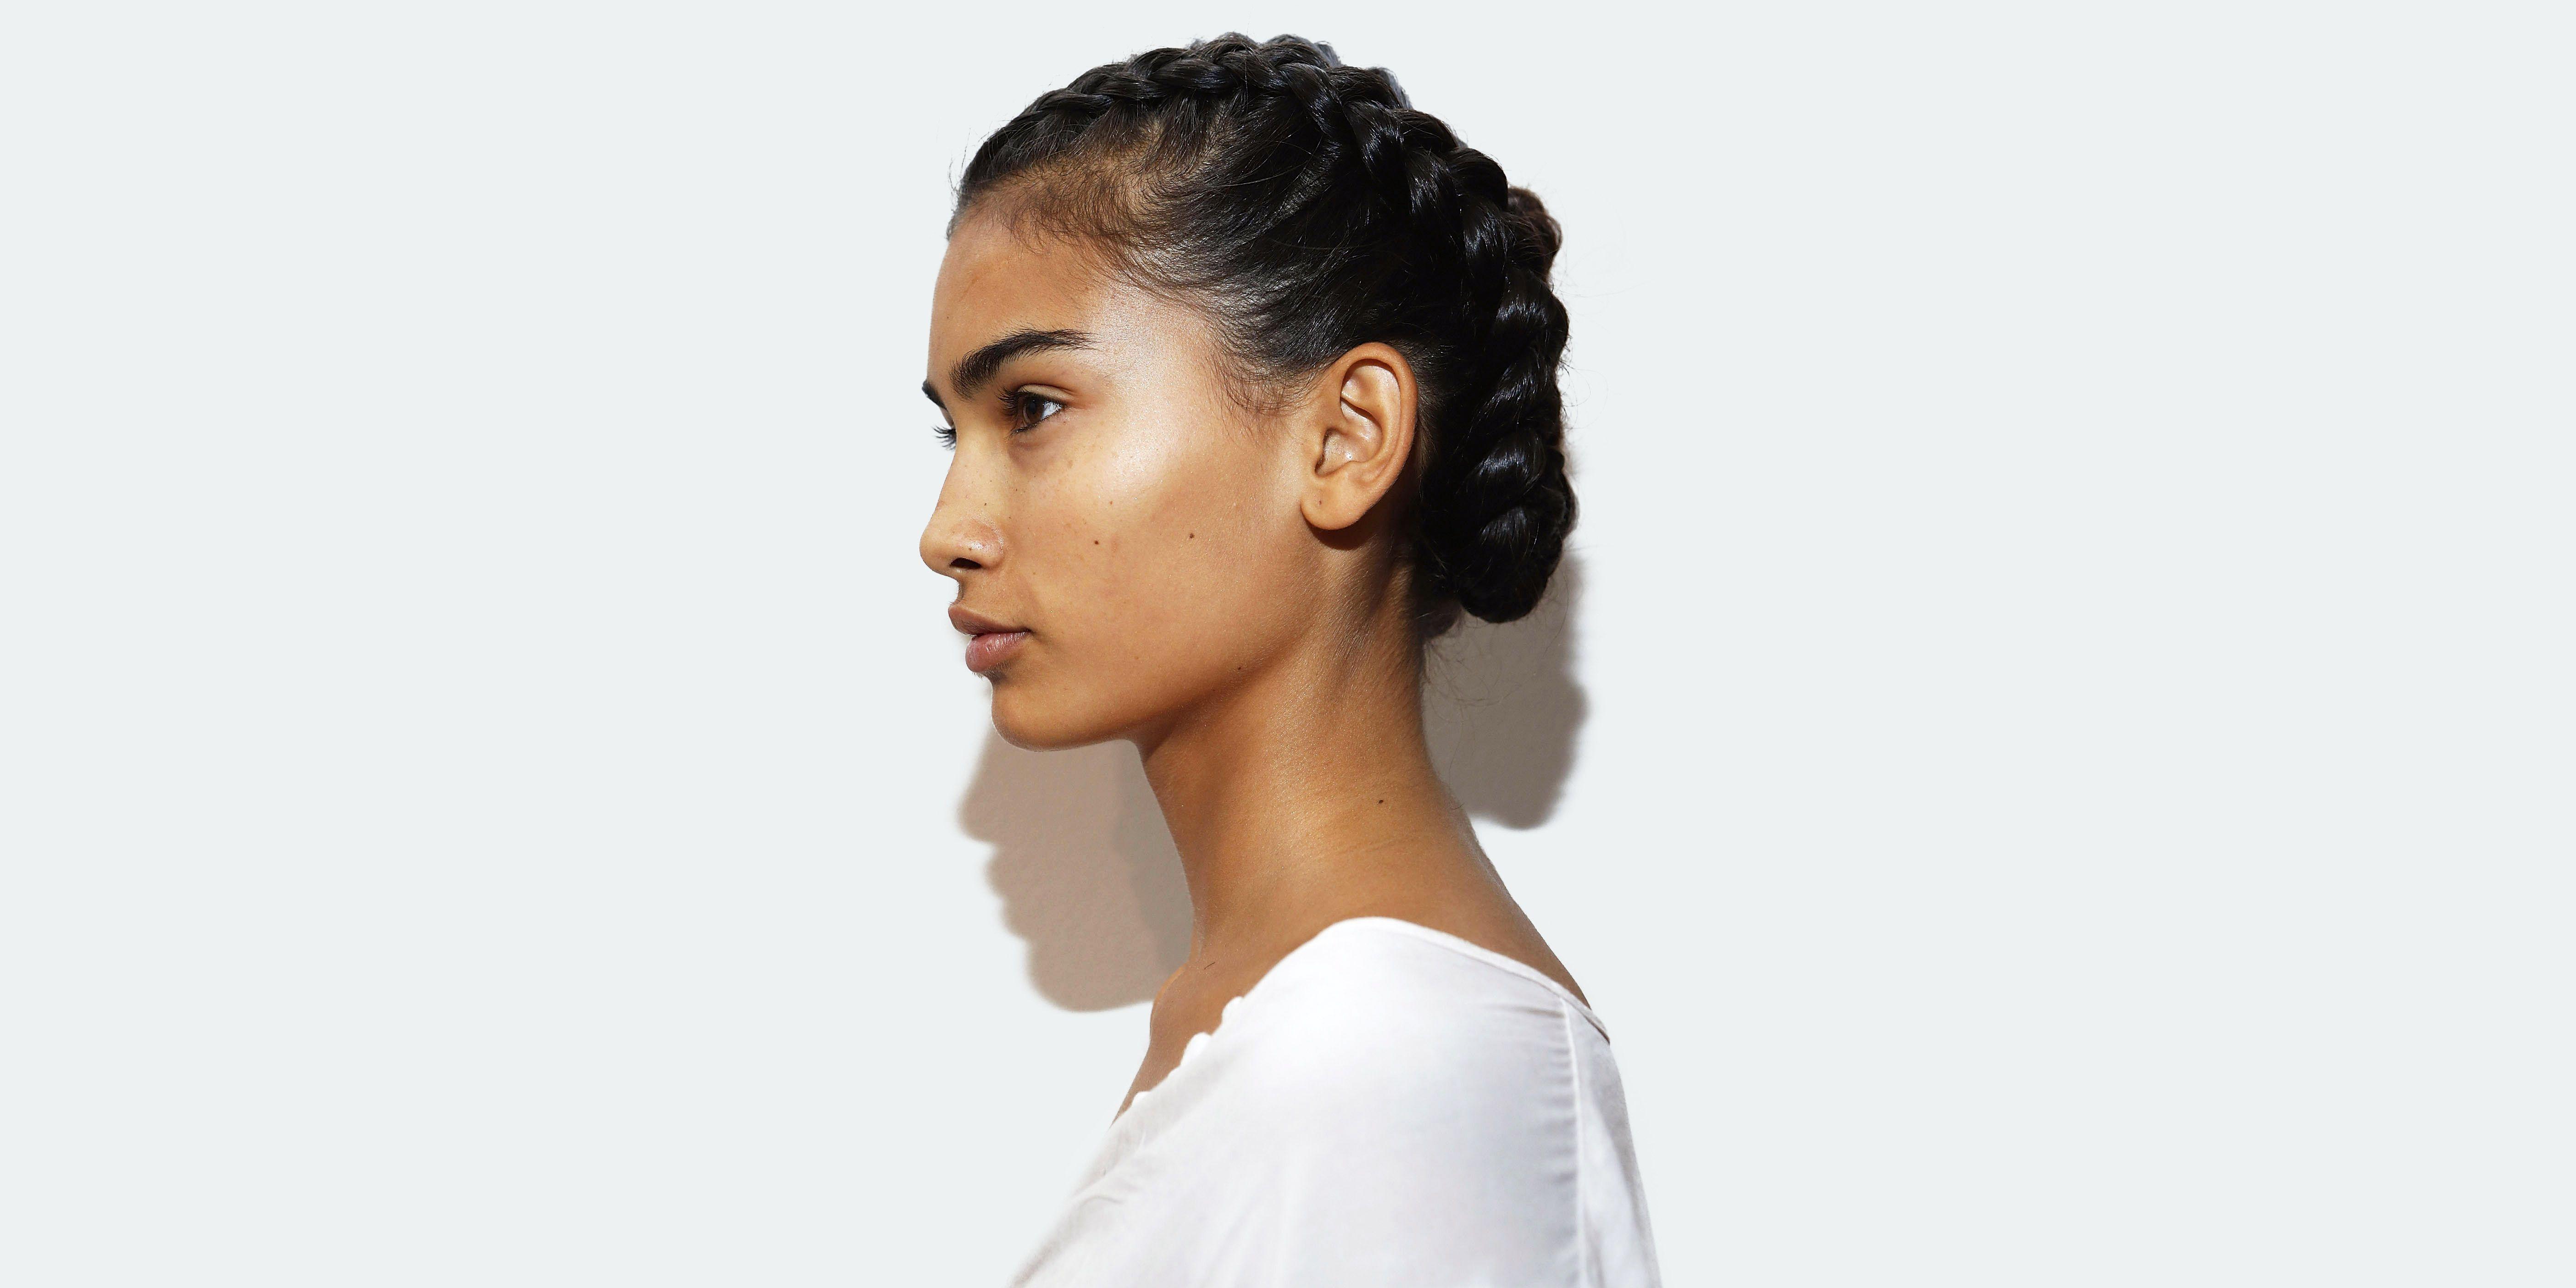 8 Fast And Easy Braid Ideas Braid Hairstyles Tutorials